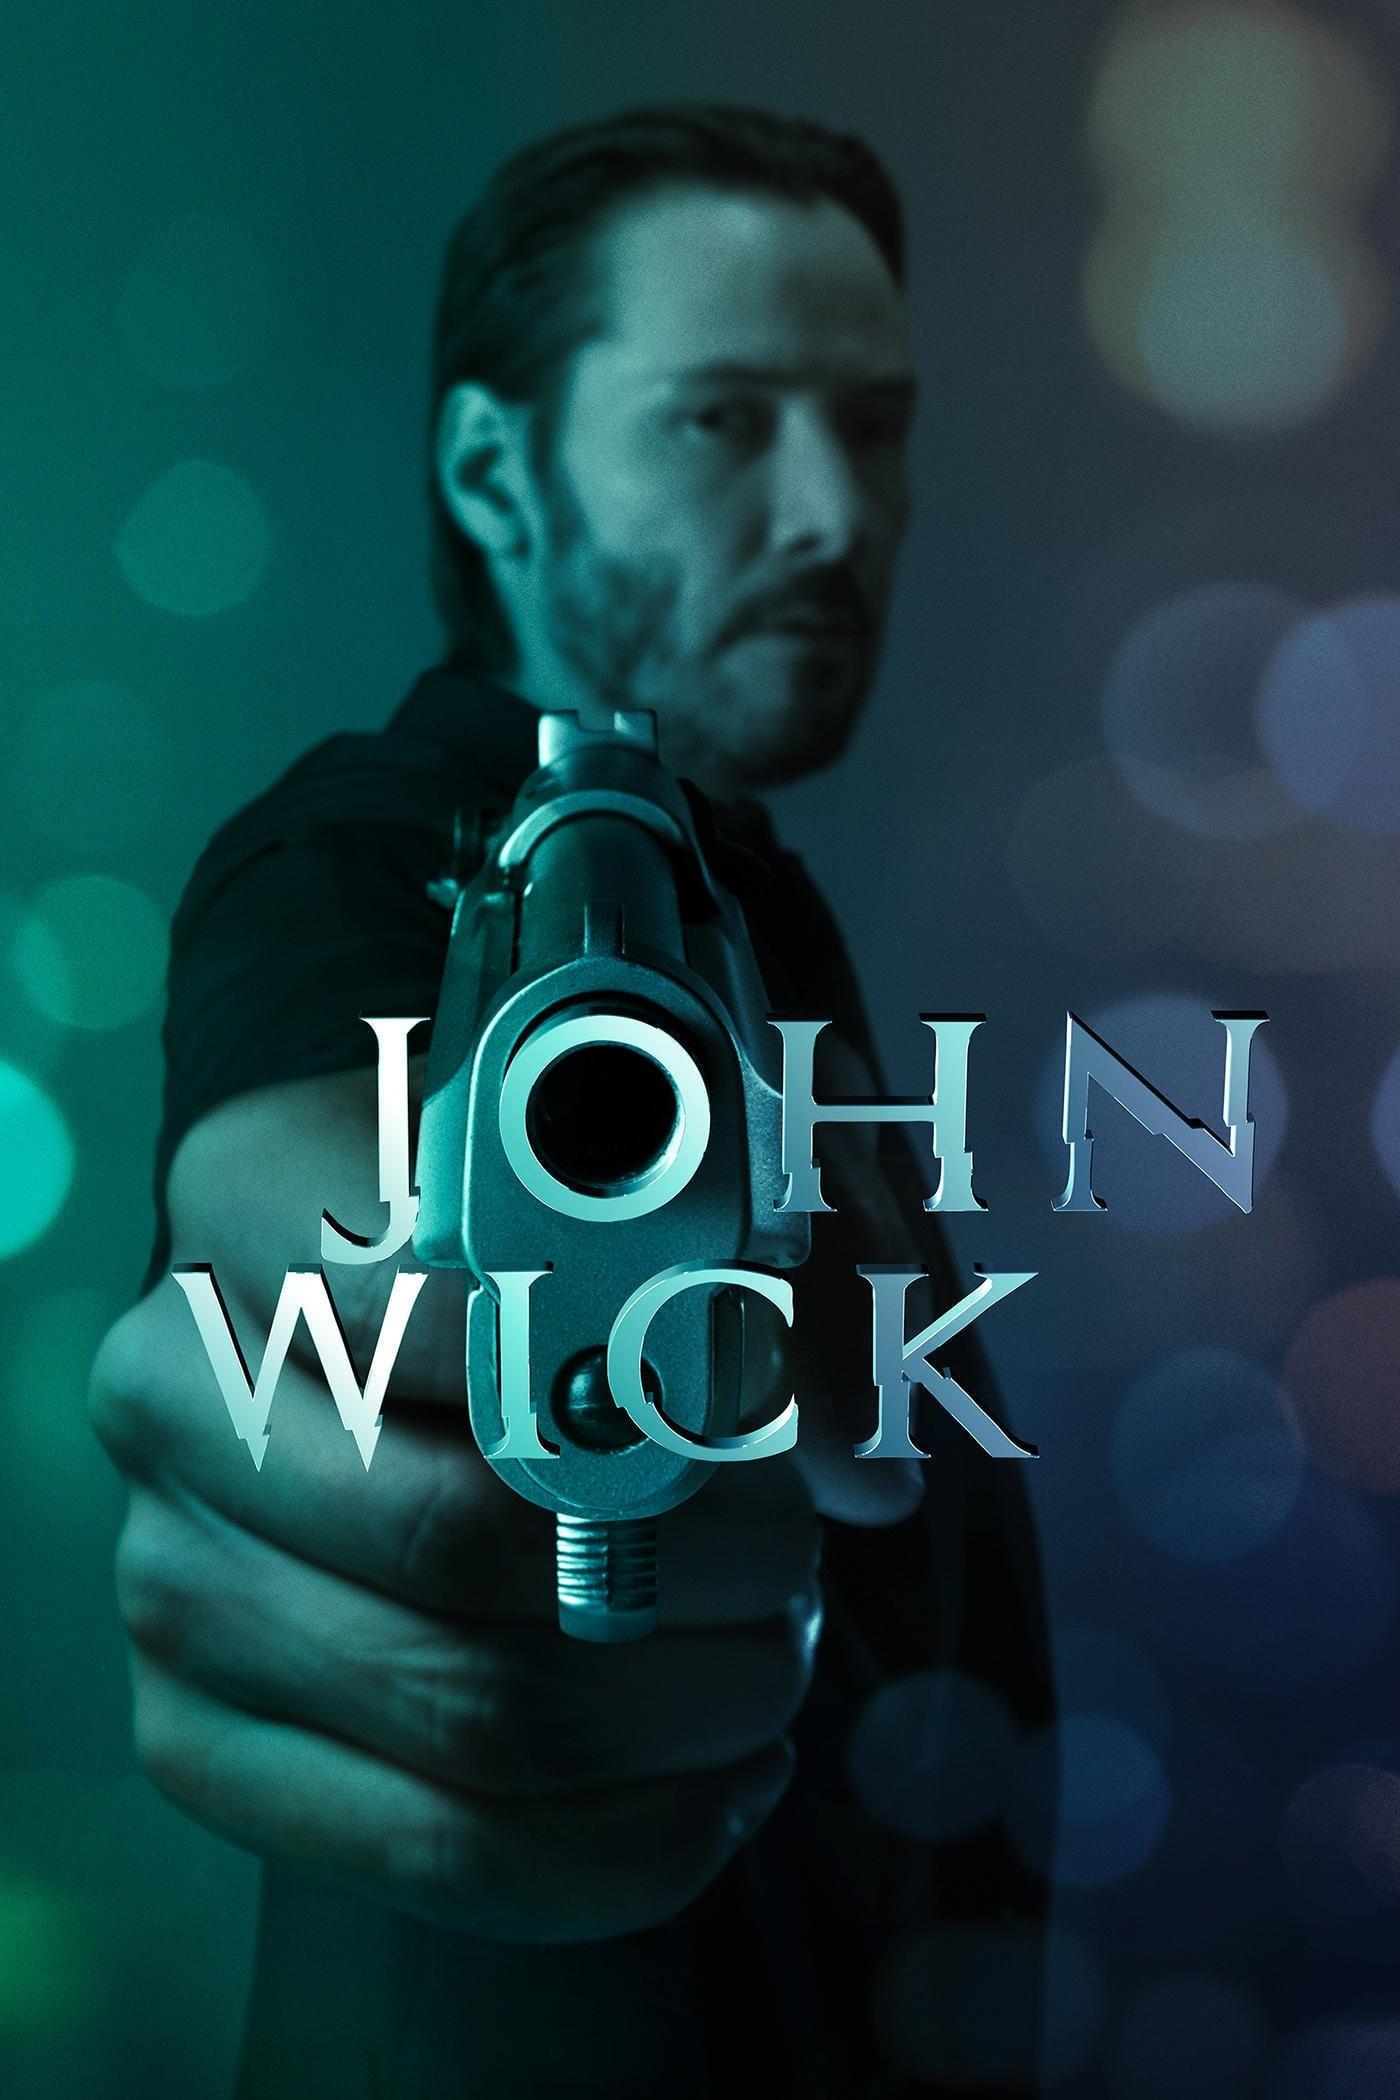 Poster and image movie Film John Wick - John Wick - John Wick -  2014